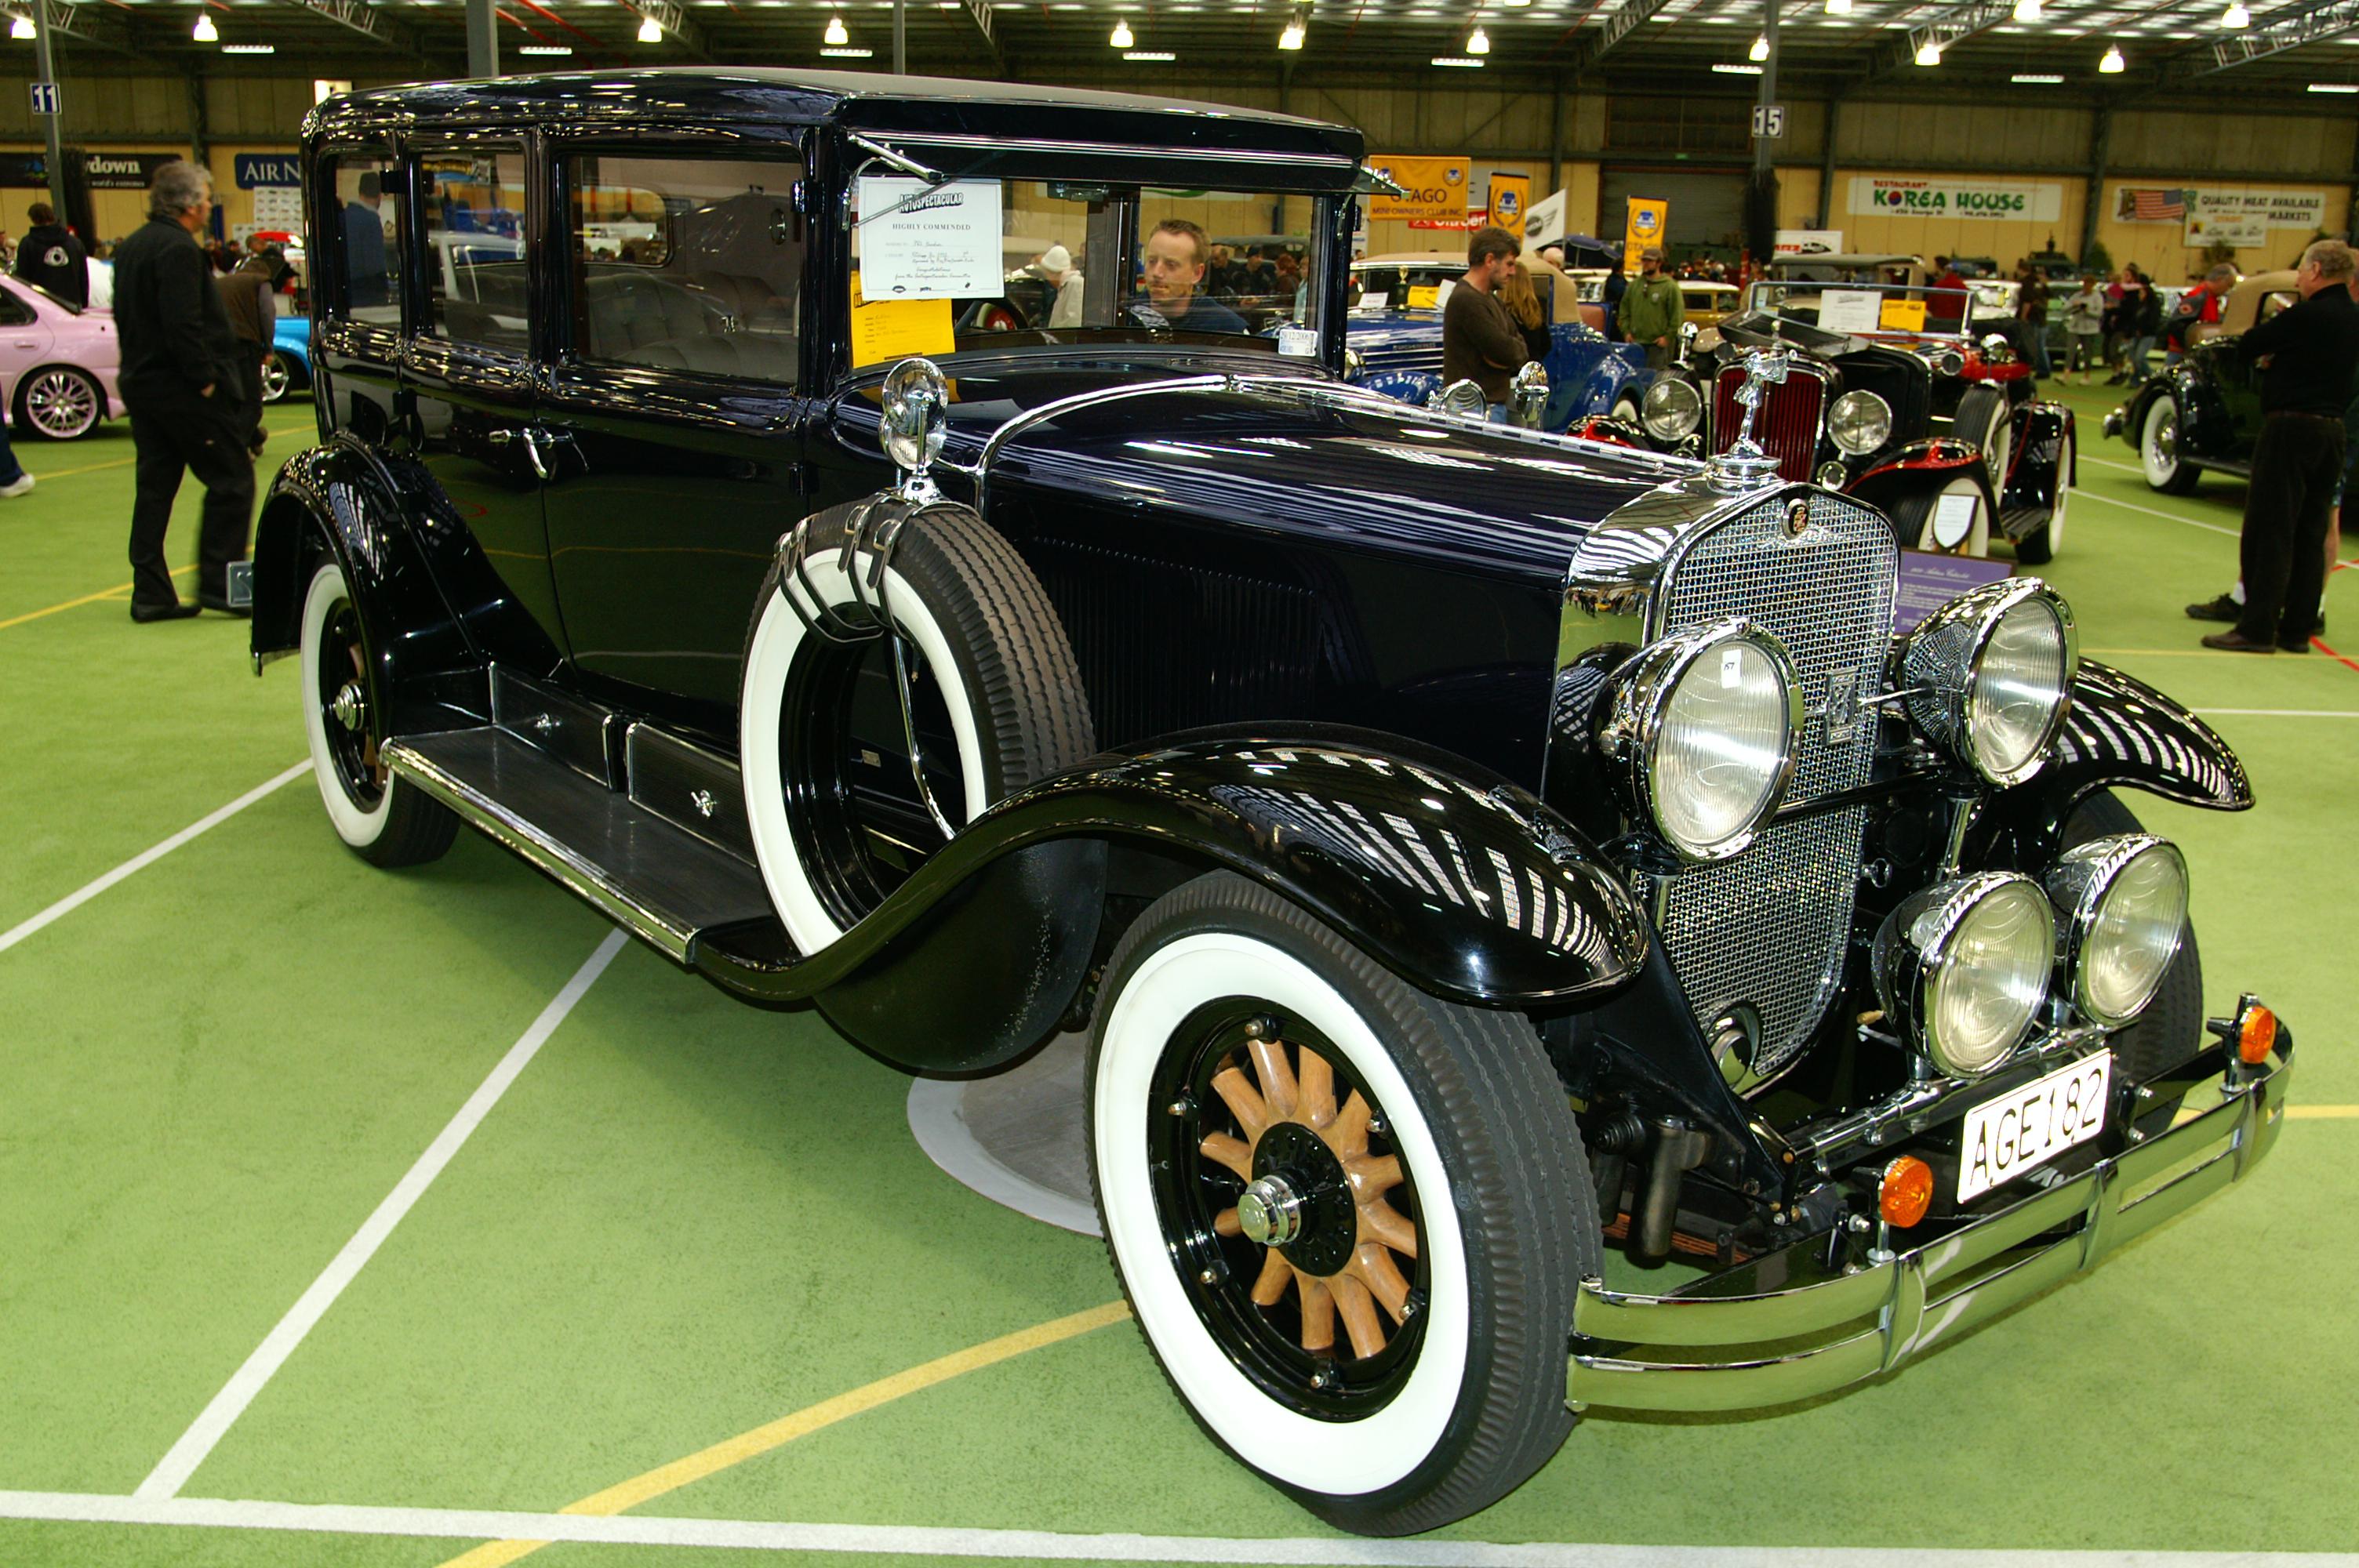 Nice Classic Car photos | Automotive Photo Gallery - Warner Ronald ...